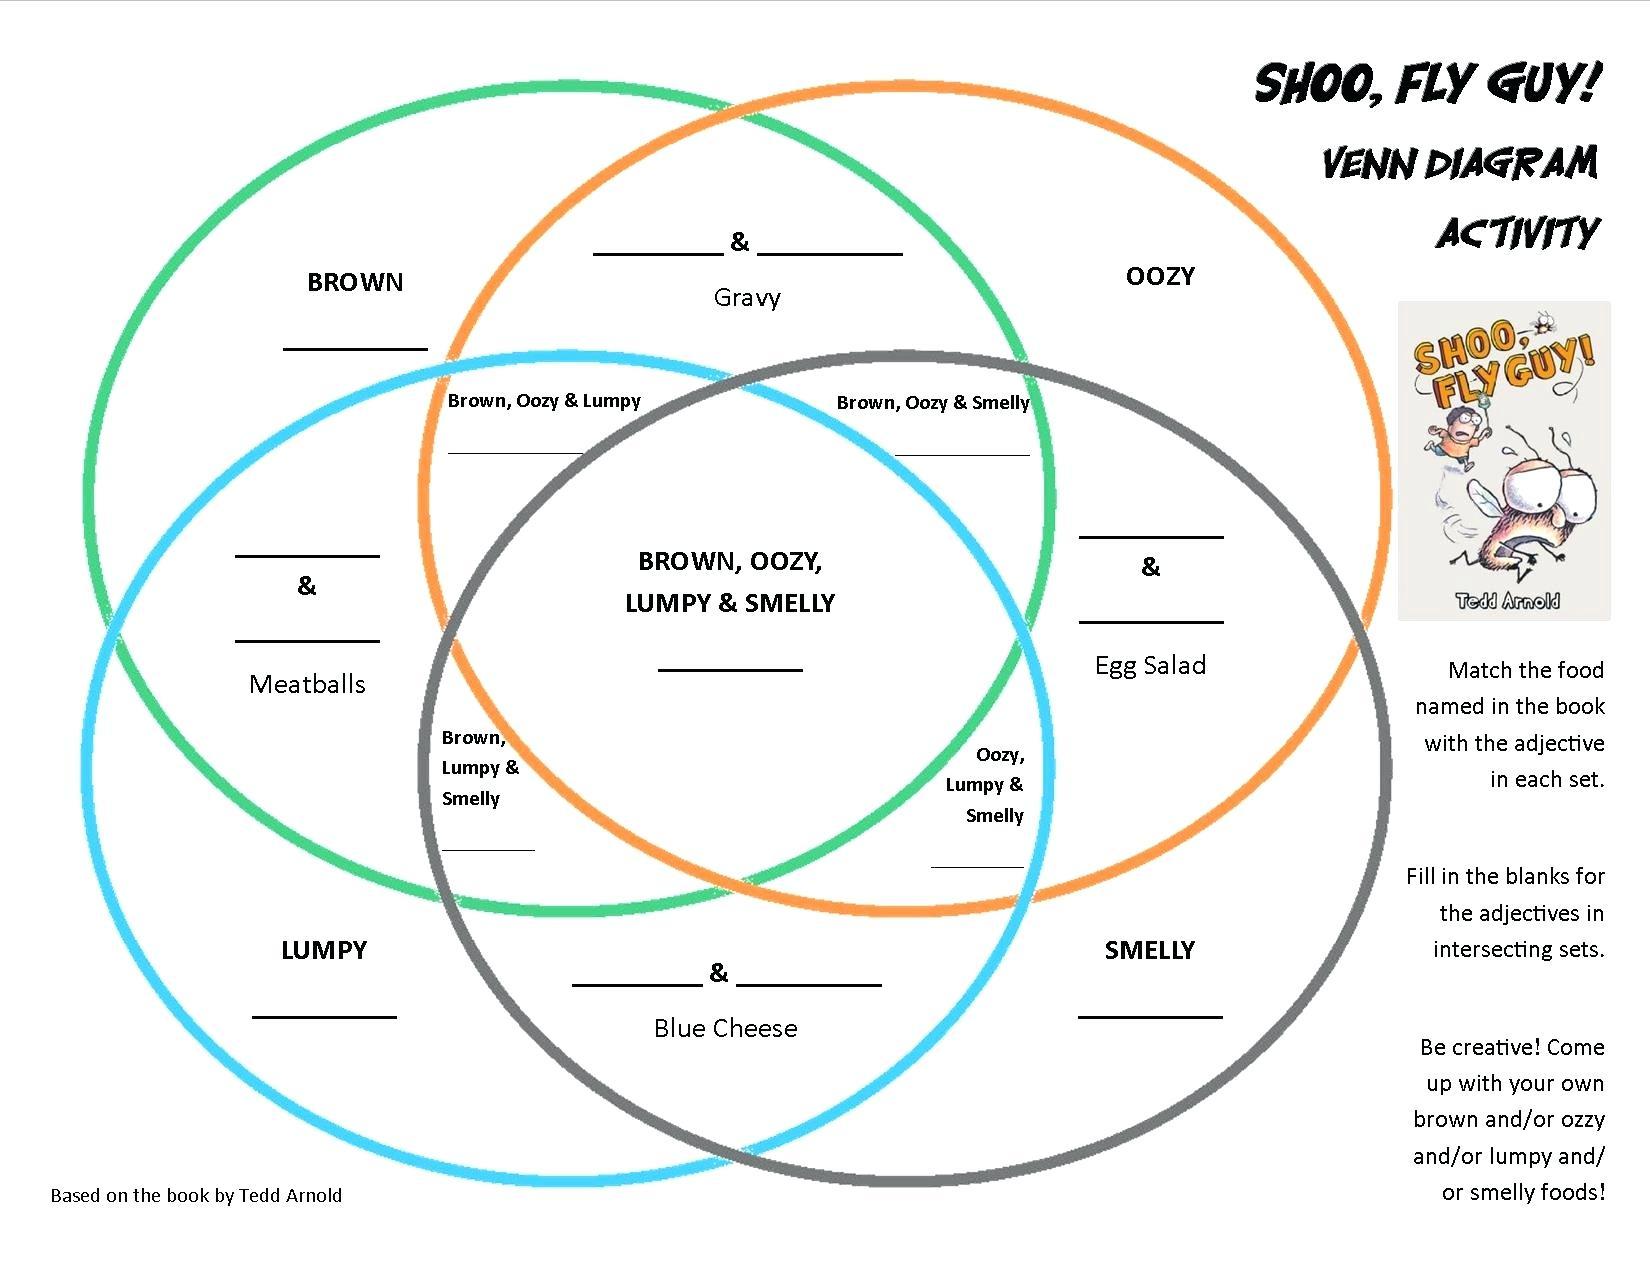 Venn Diagram Worksheet How To Read A Venn Diagram Math Shoo Fly Guy Diagram Reading Venn